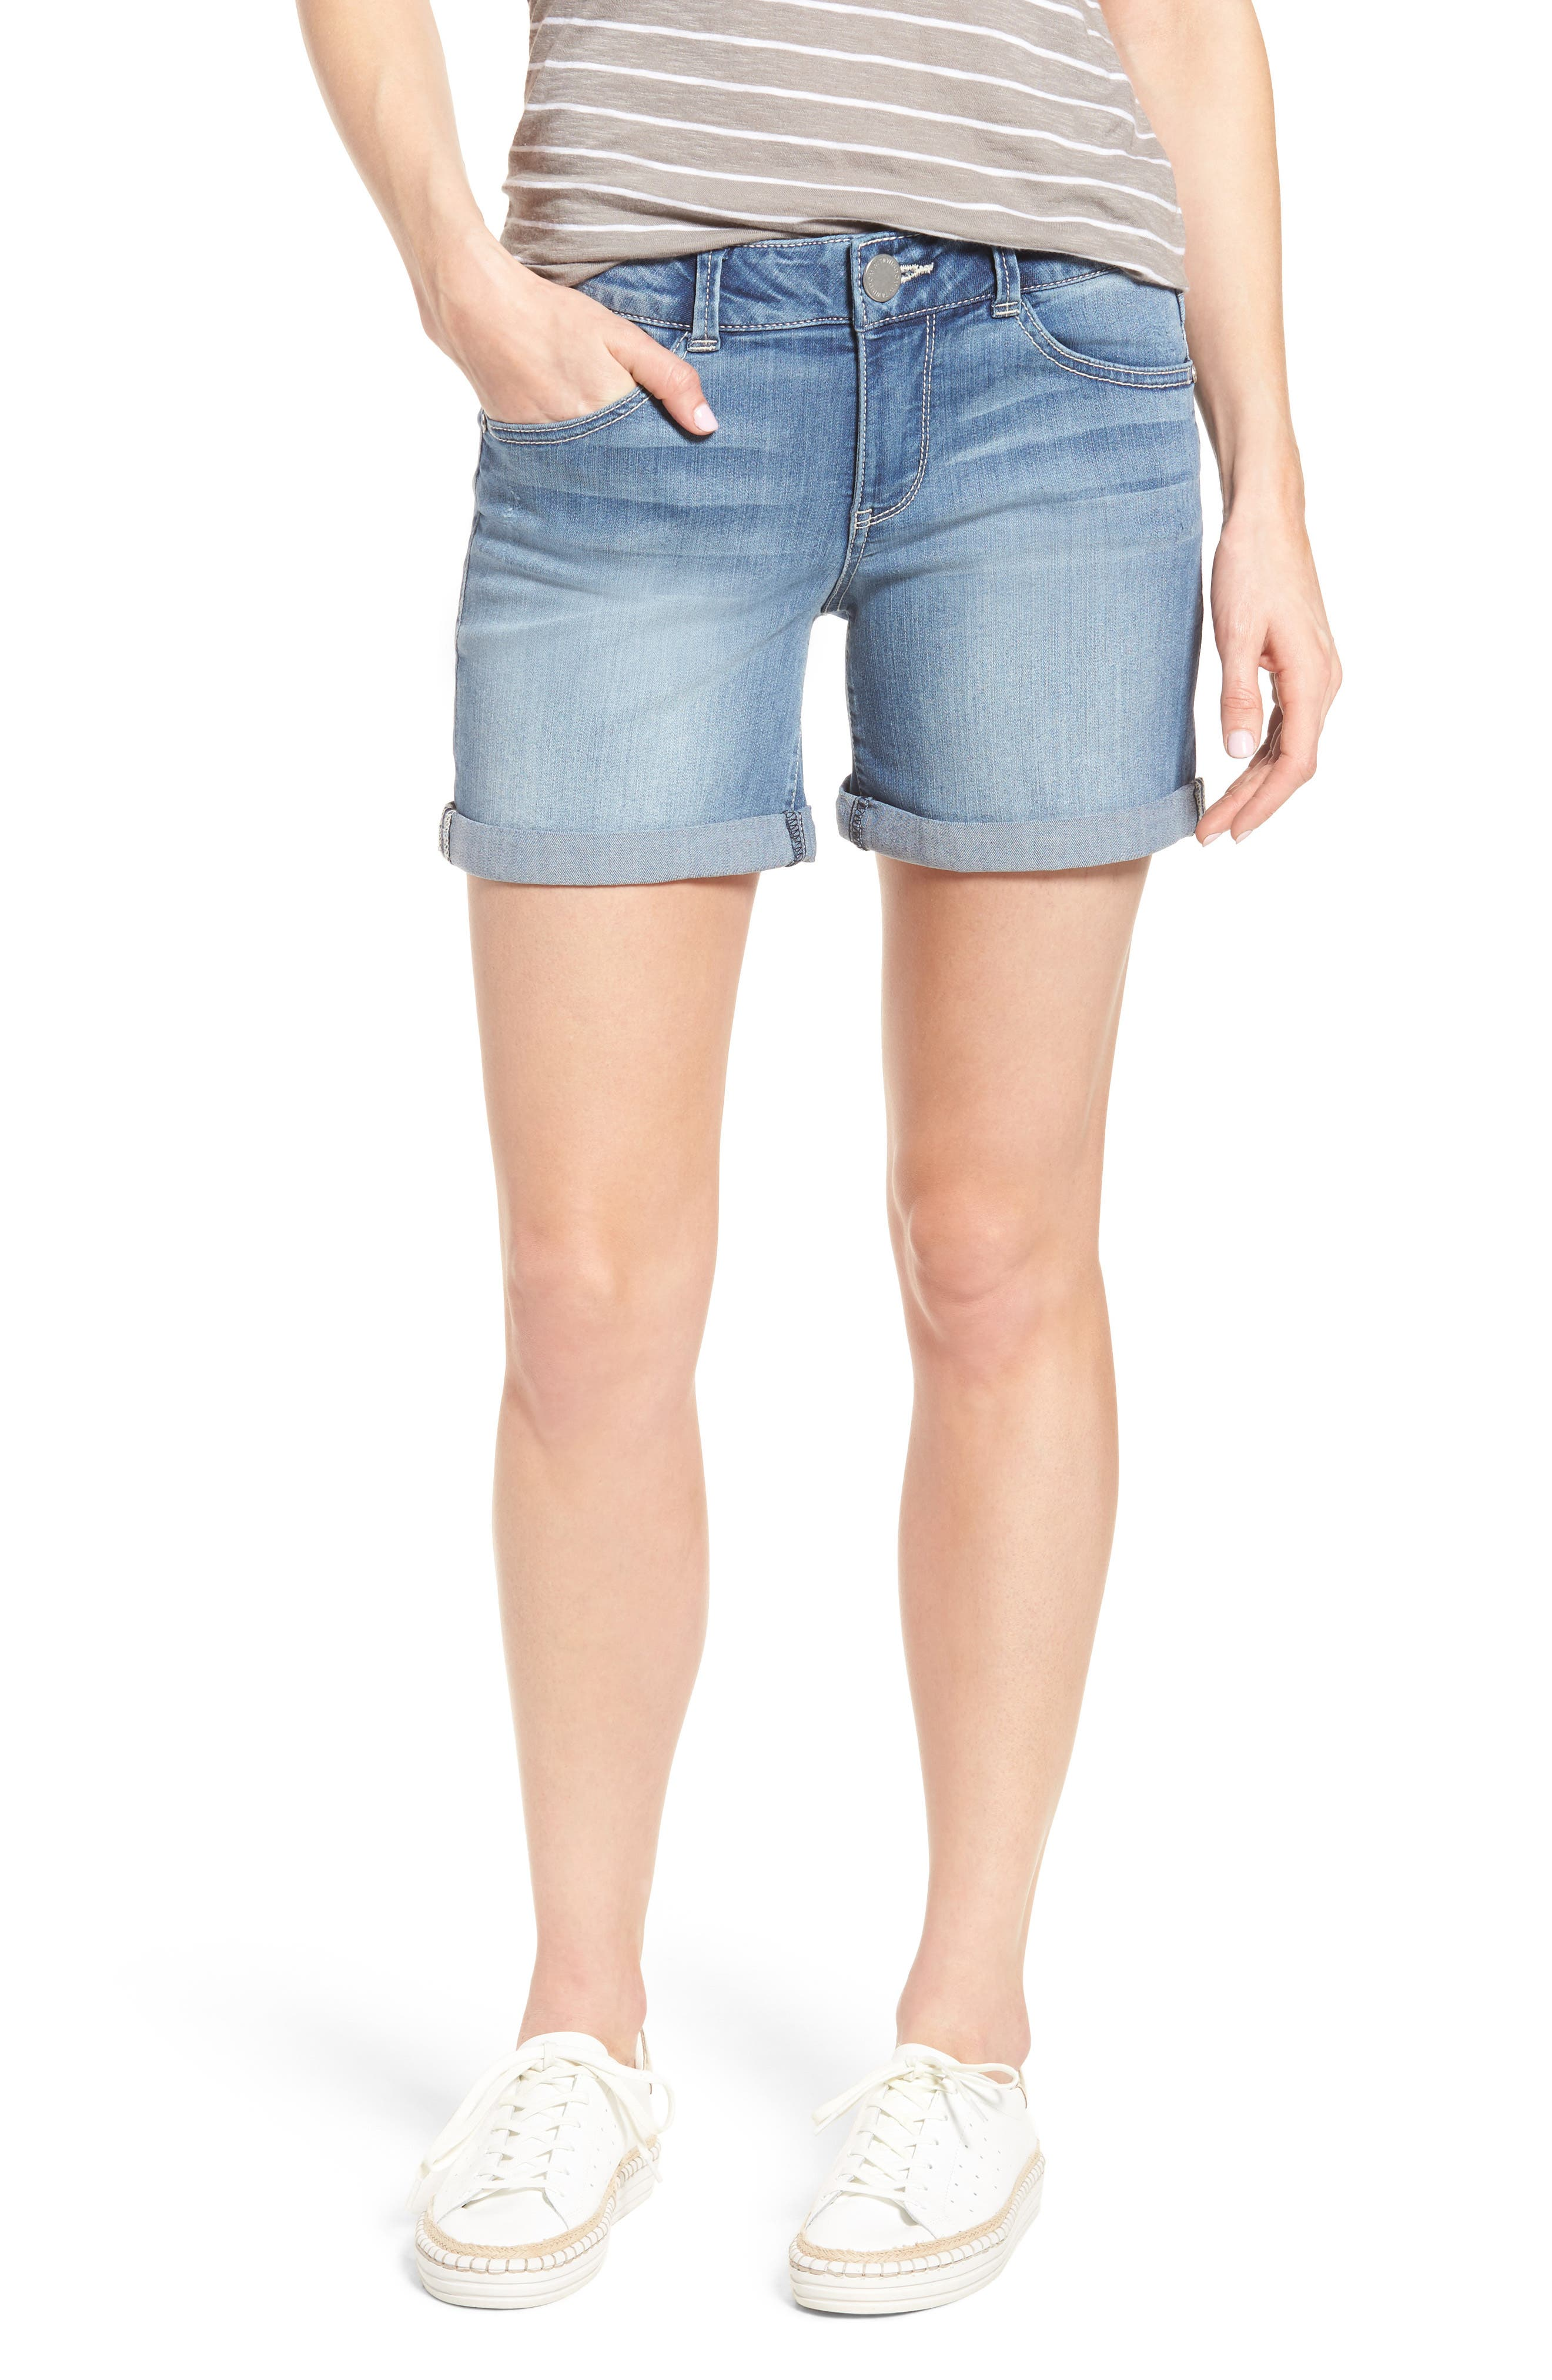 Ab-solution Cuffed Denim Shorts,                         Main,                         color, Light Blue